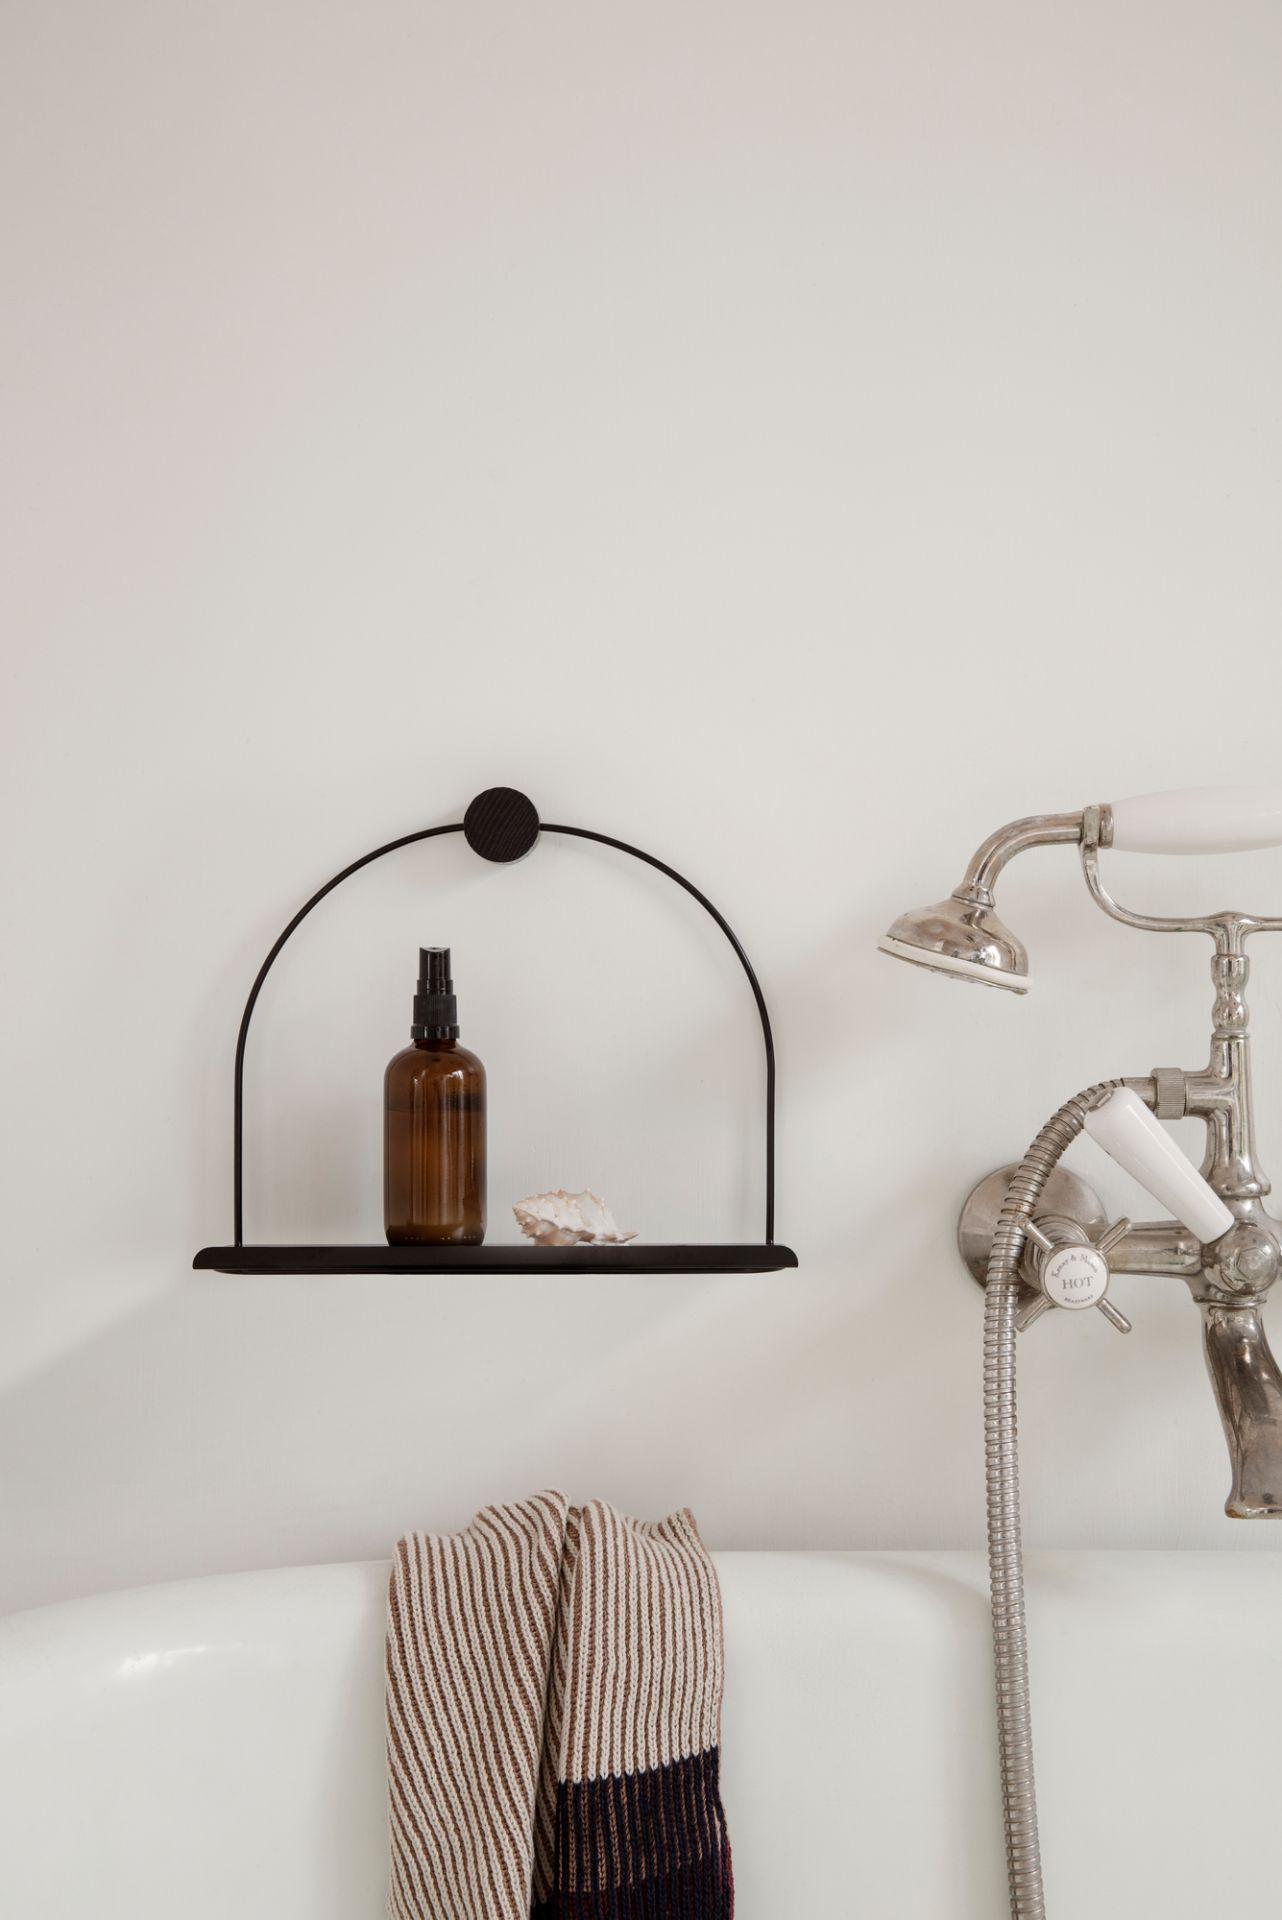 Bathroom Shelf Badezimmerregal Ferm Living Messing